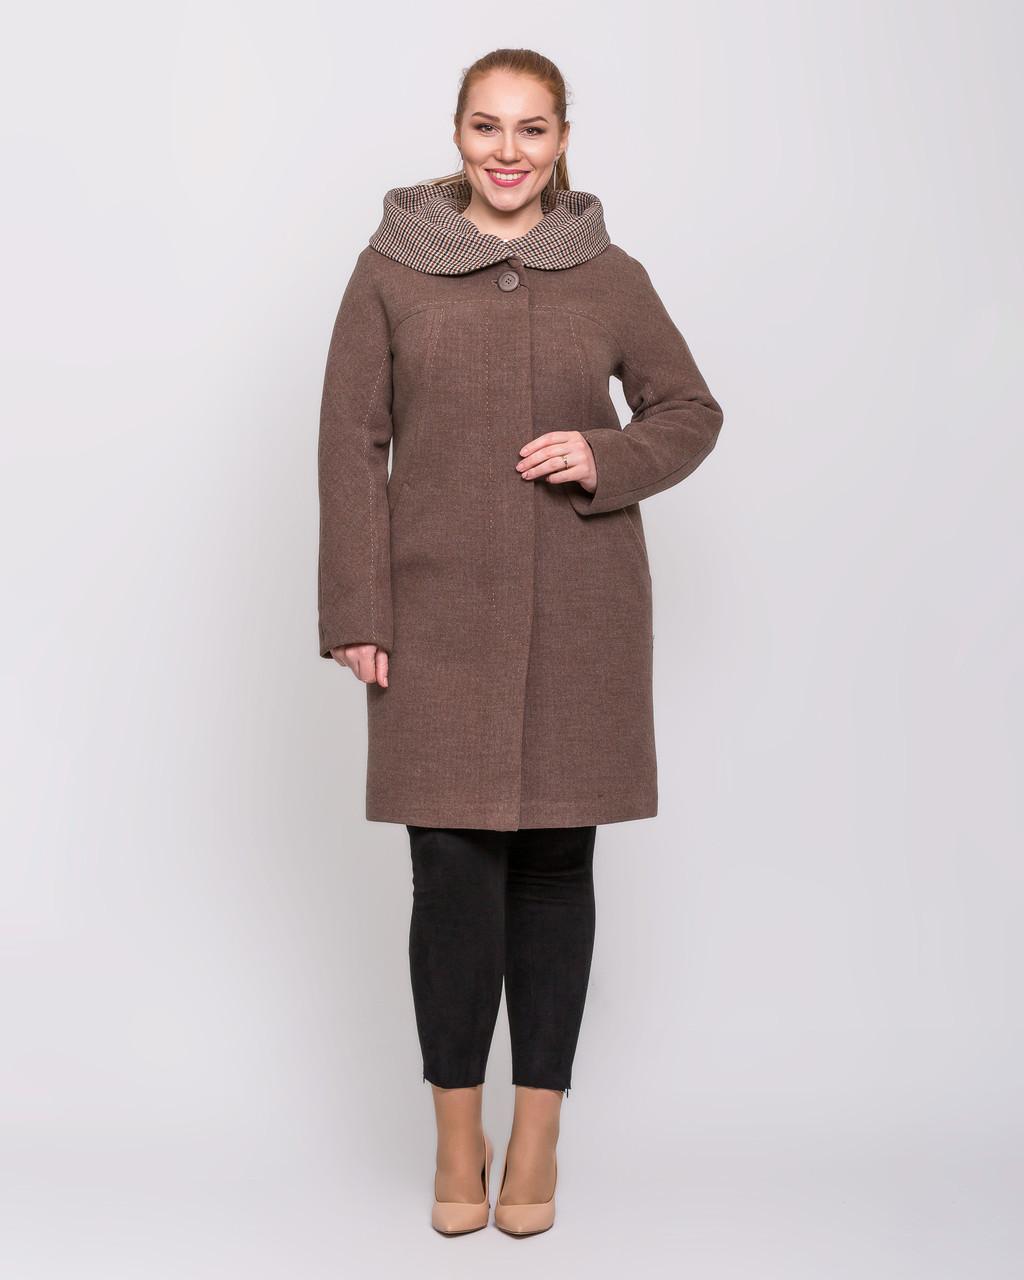 Пальто з капюшоном з 50 по 58 р. Весна 2020